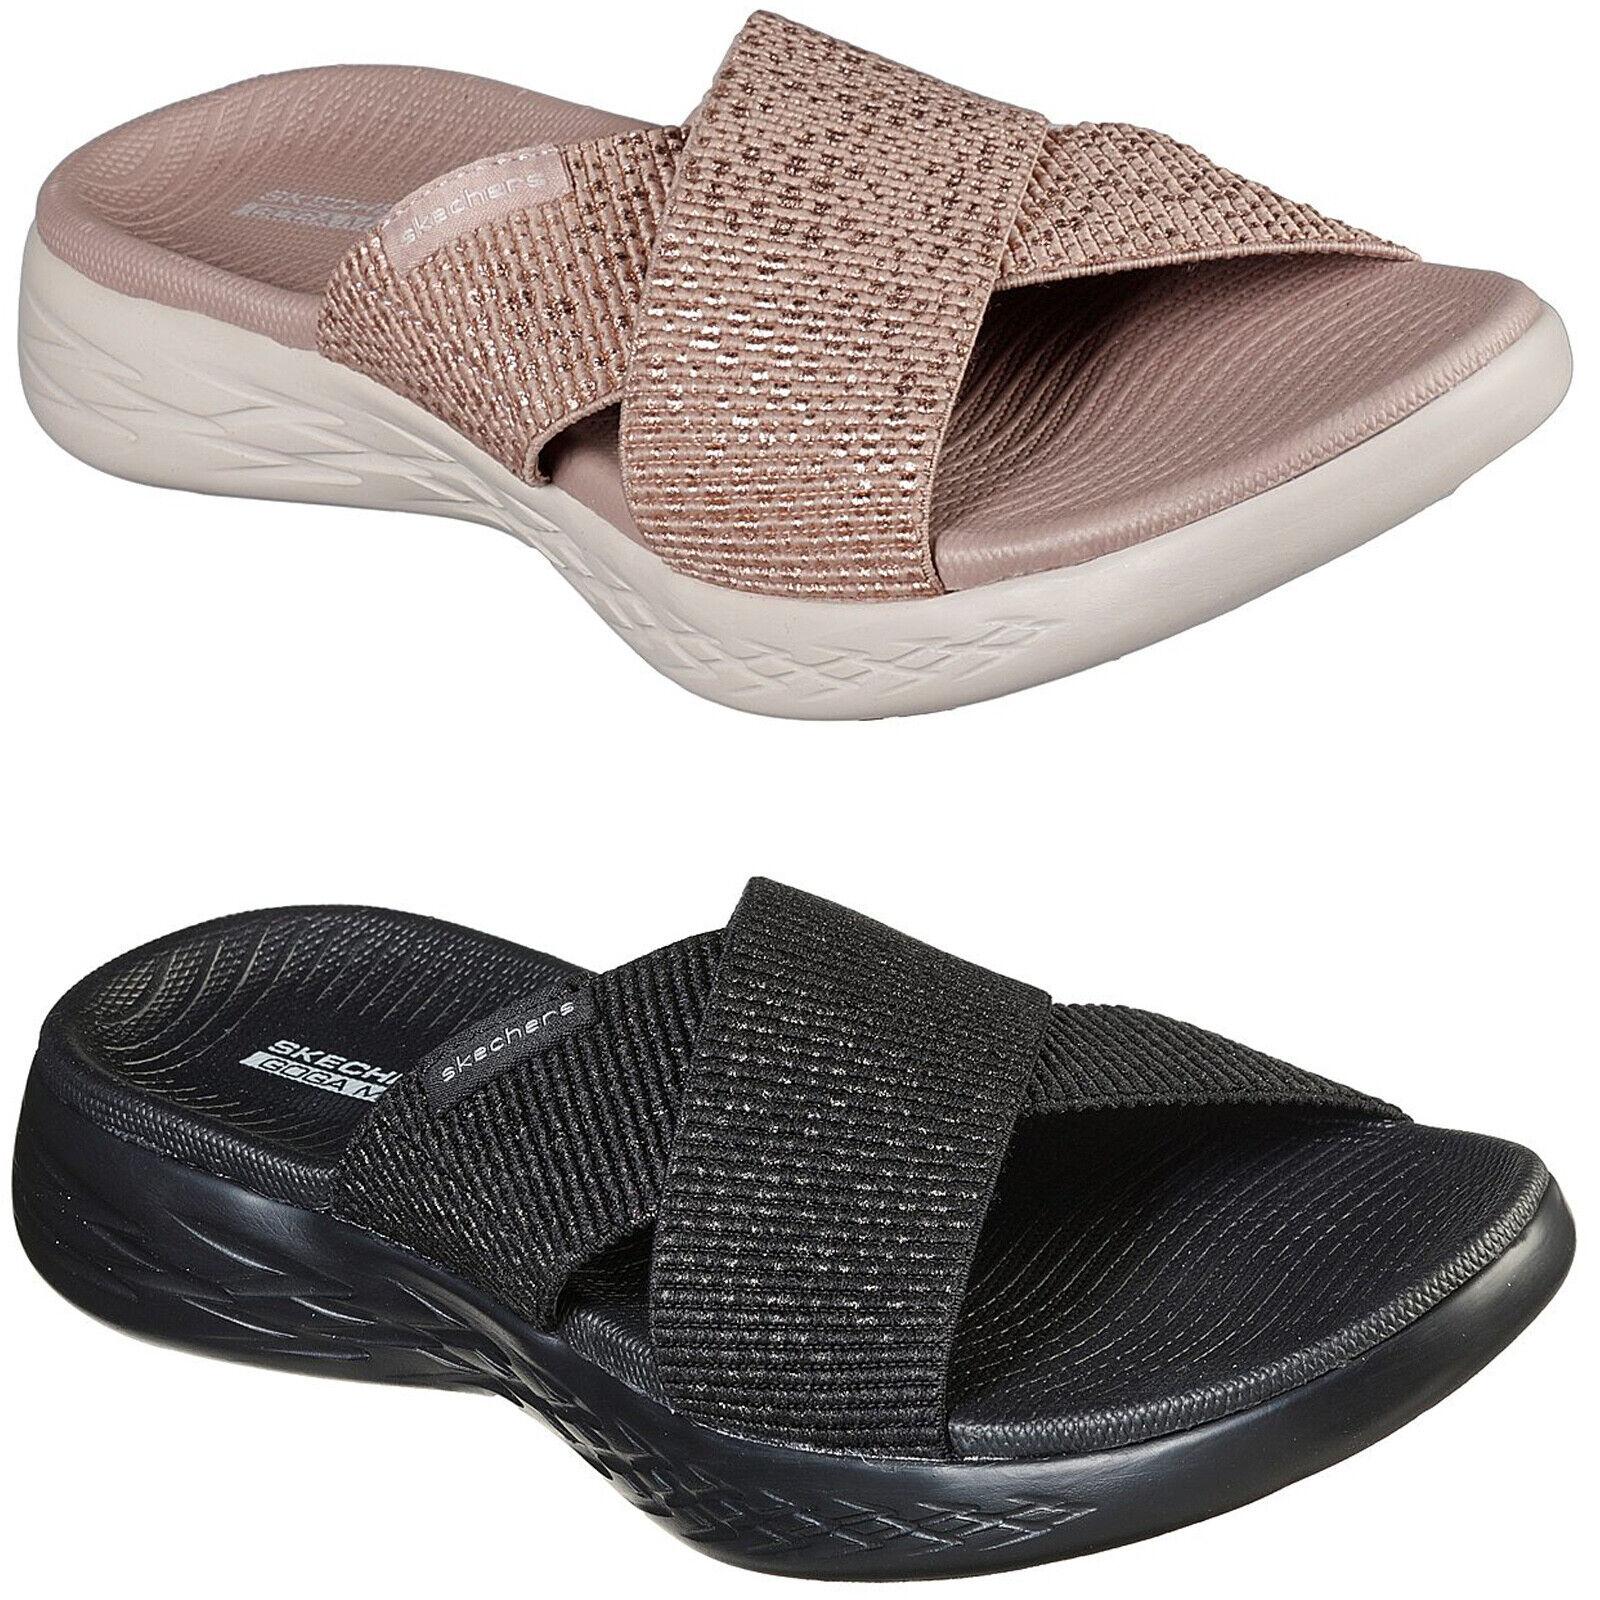 Skechers auf The Go 600 Gleißendes Damen Sandalen Sommer Goga Slides